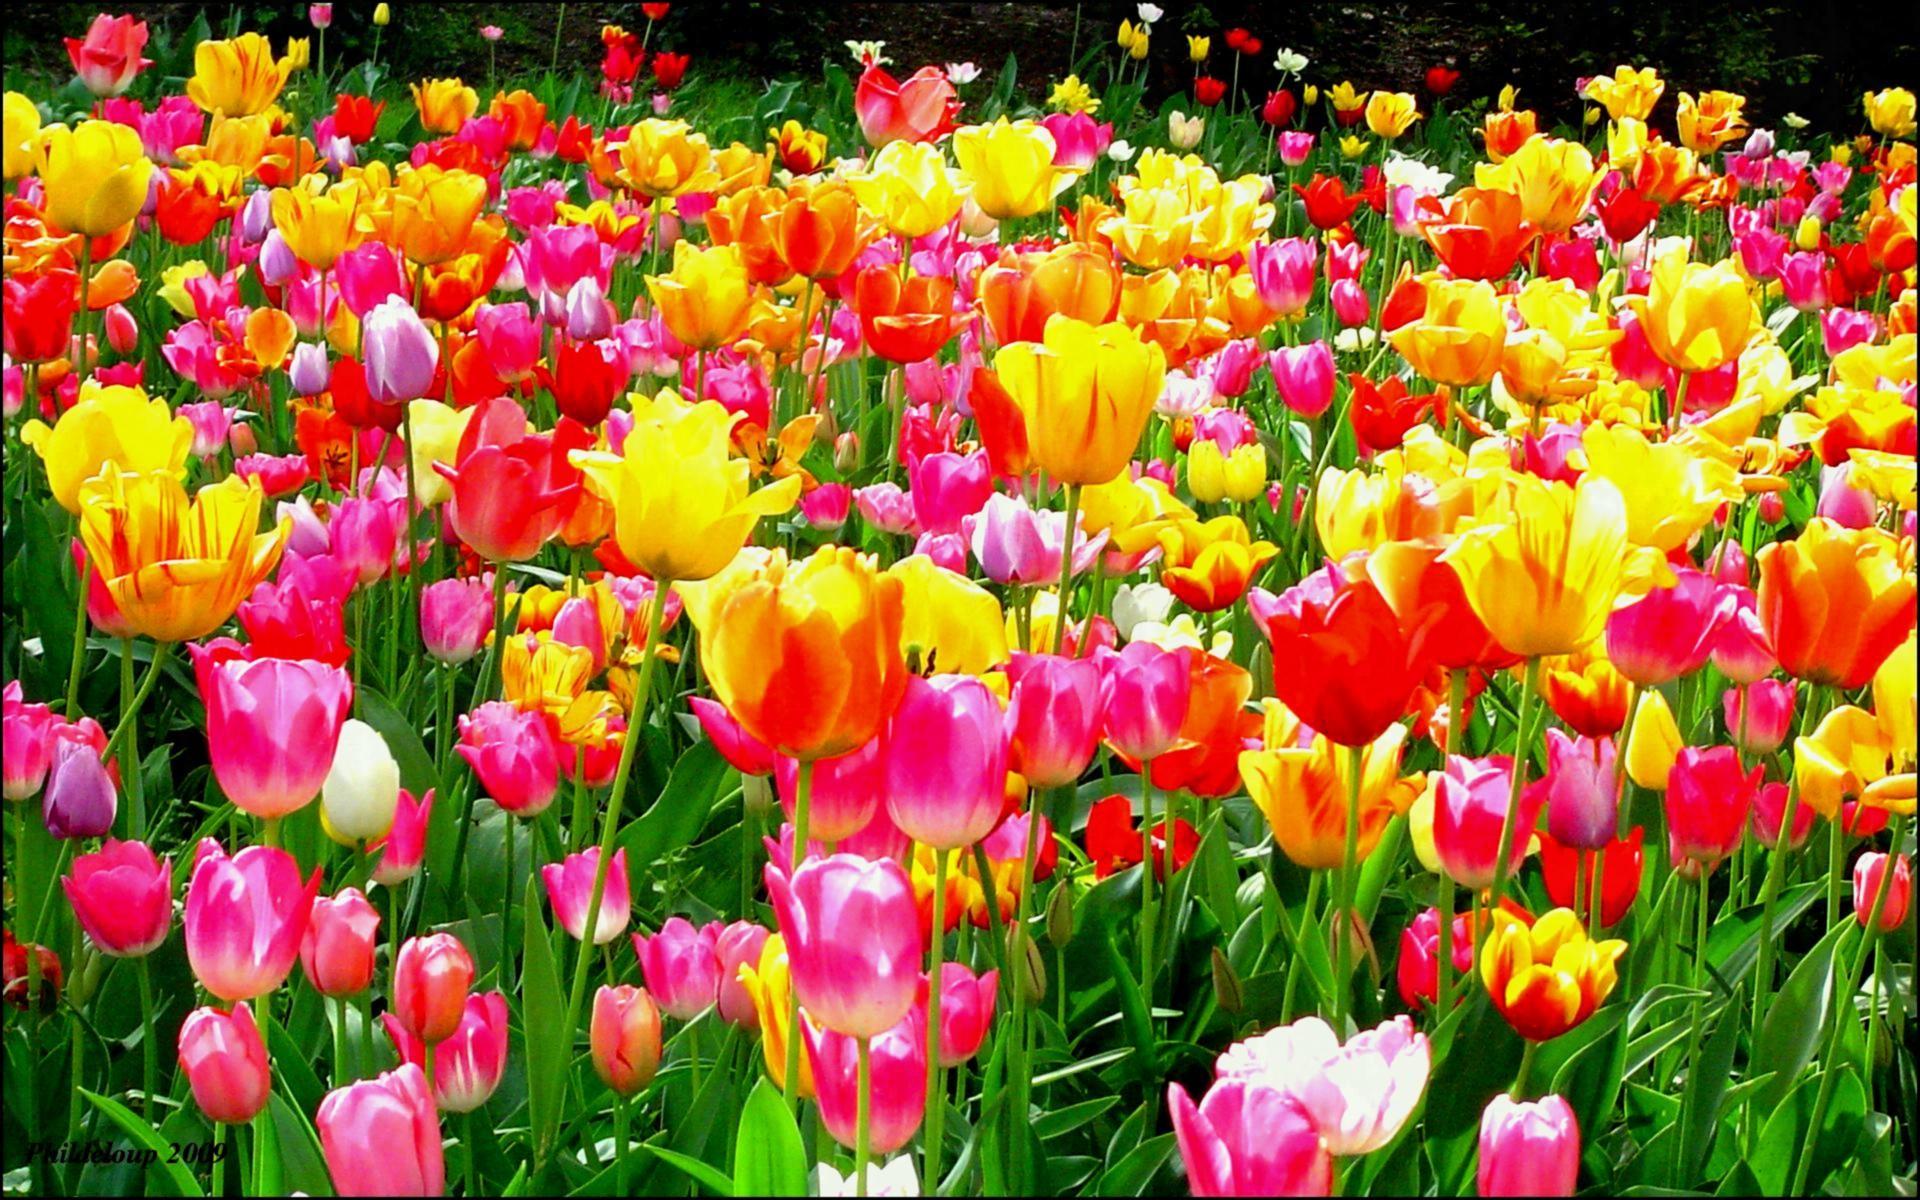 Res: 1920x1200, Tulip Flower Garden Wallpaper Eleletsitz Images Dream Spring Beautiful  Gardenx